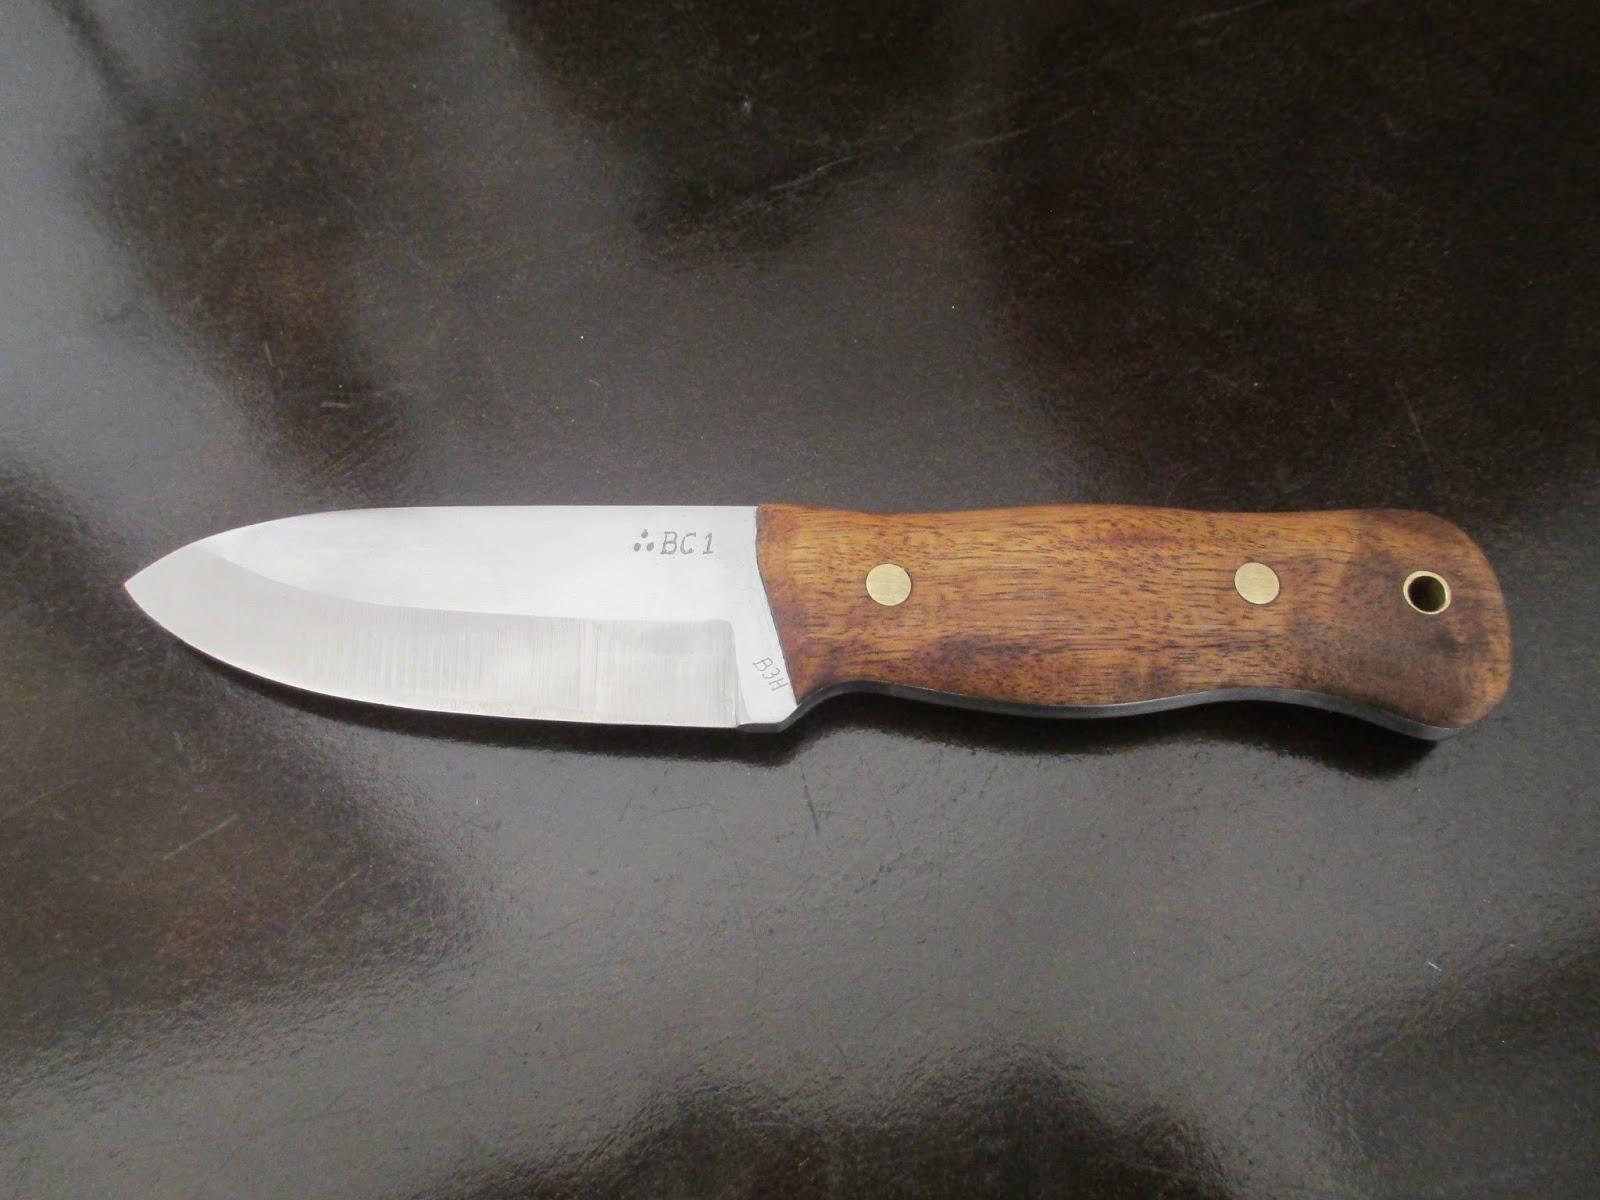 DIY Knifemaker's Info Center: BC1 - MAKING A STOUT BUSHCRAFT